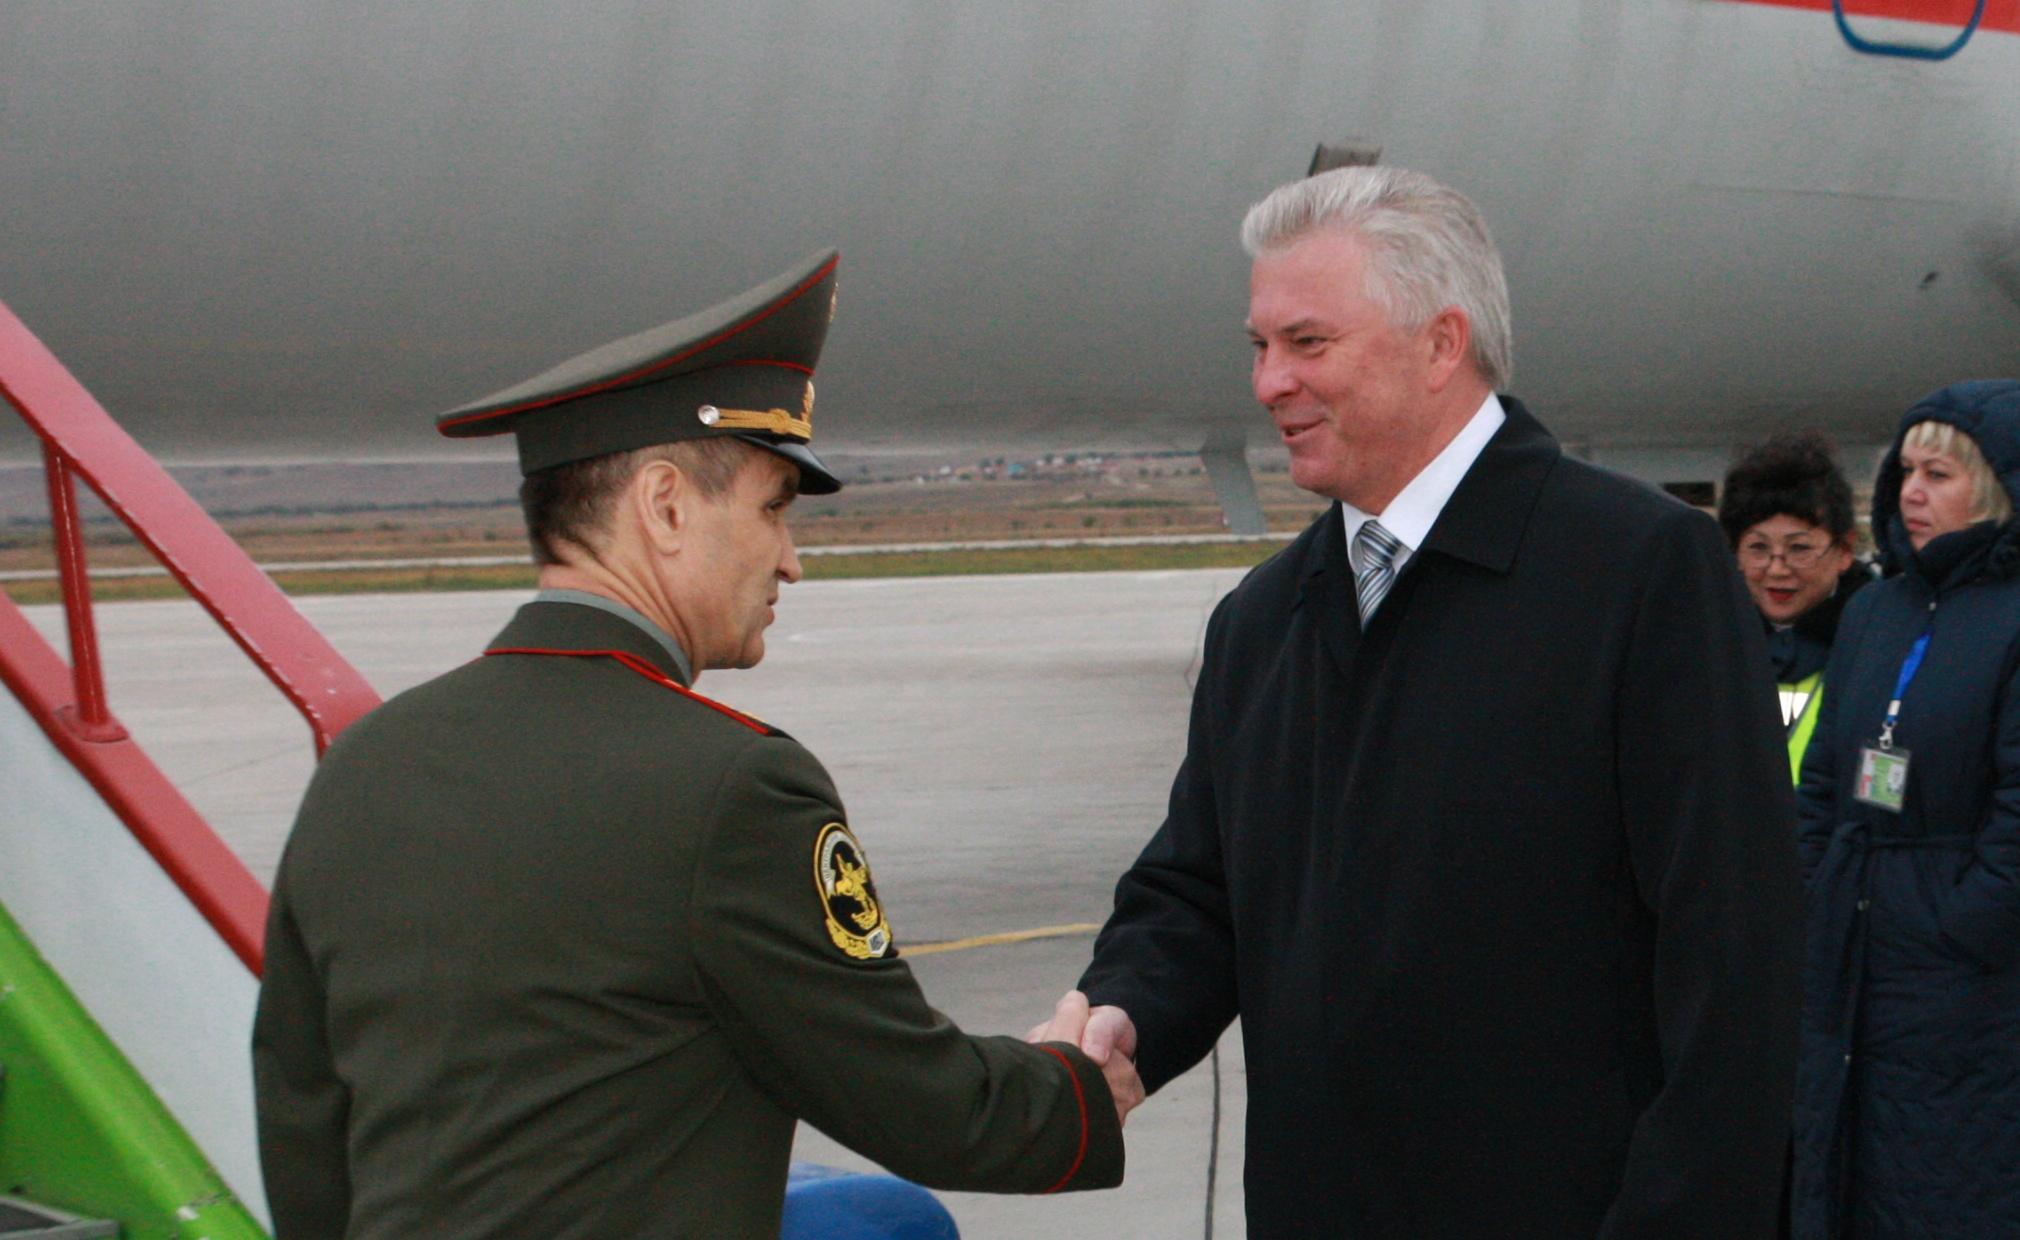 Глава МВД России Рашид Нургалиев в Бурятии